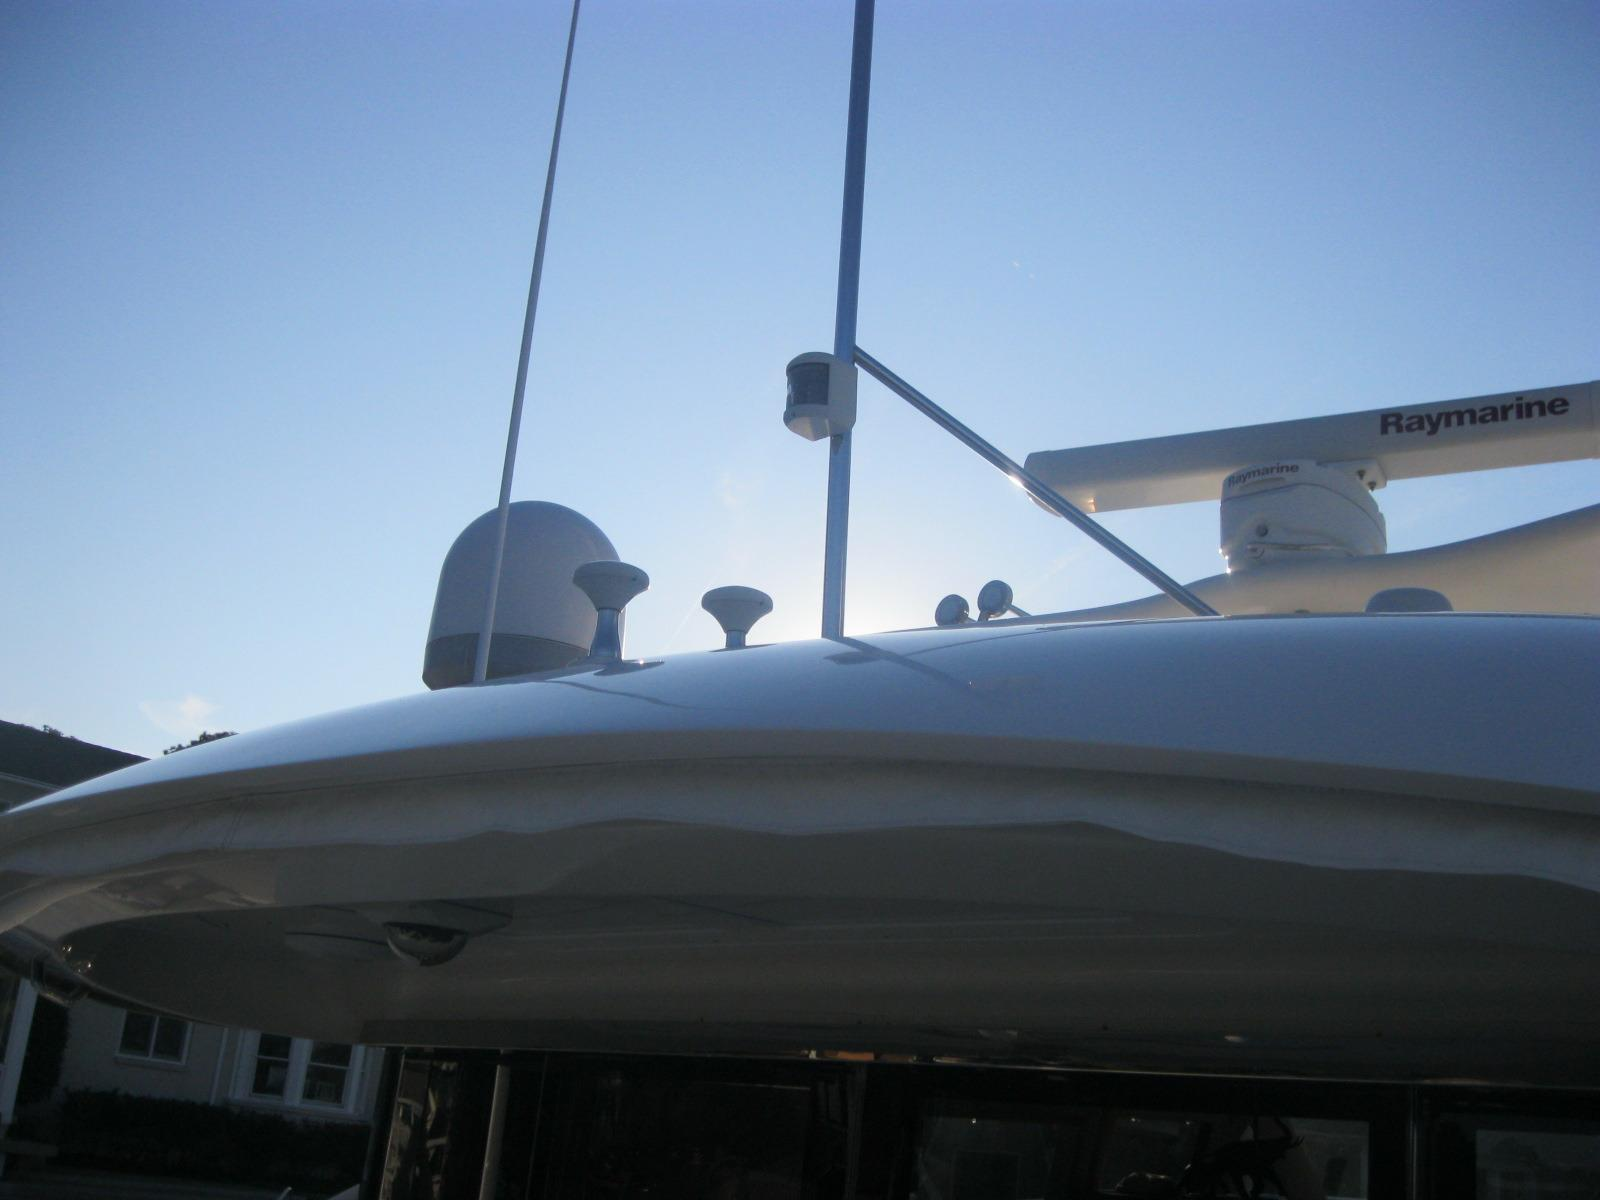 2005 Sea Ray 680 Sun Sport for sale : 4856111201512110559513291XLARGE from www.galatiyachts.com size 1600 x 1200 jpeg 94kB